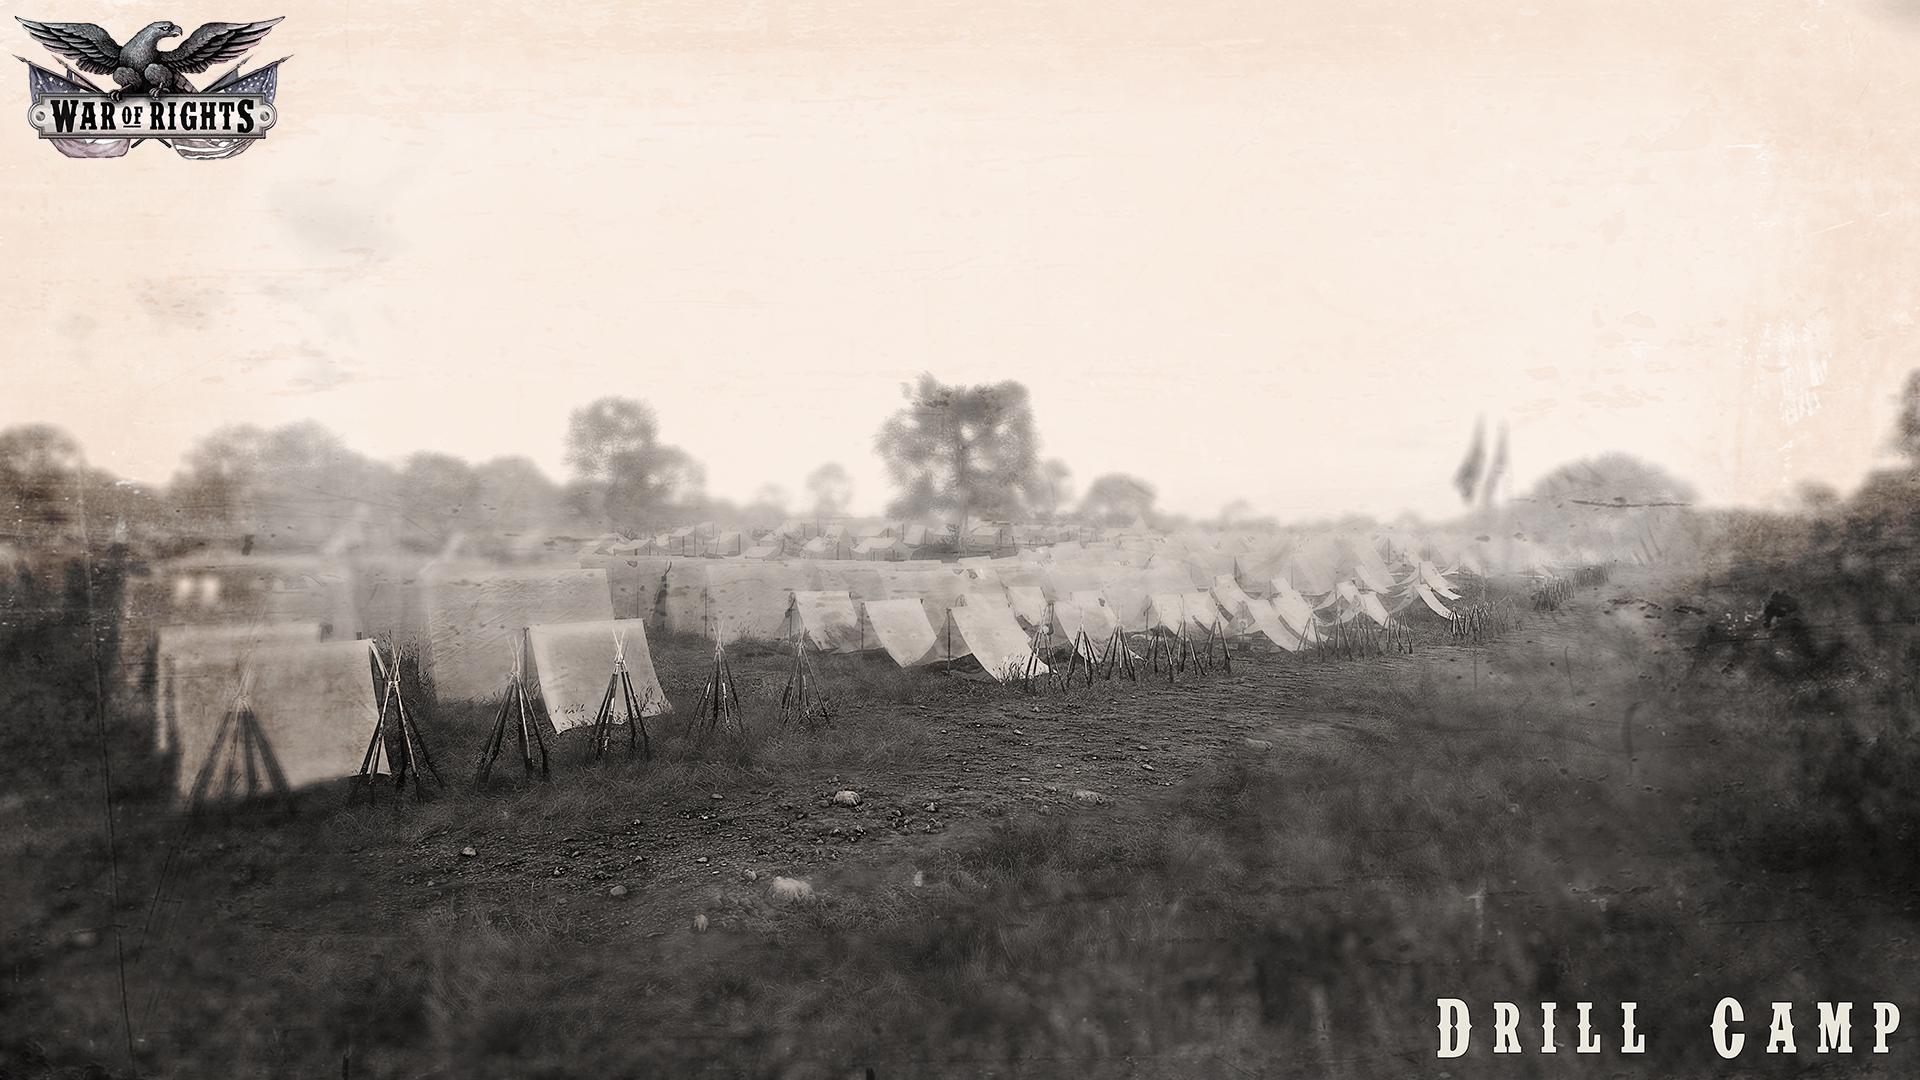 Drill Camp Release